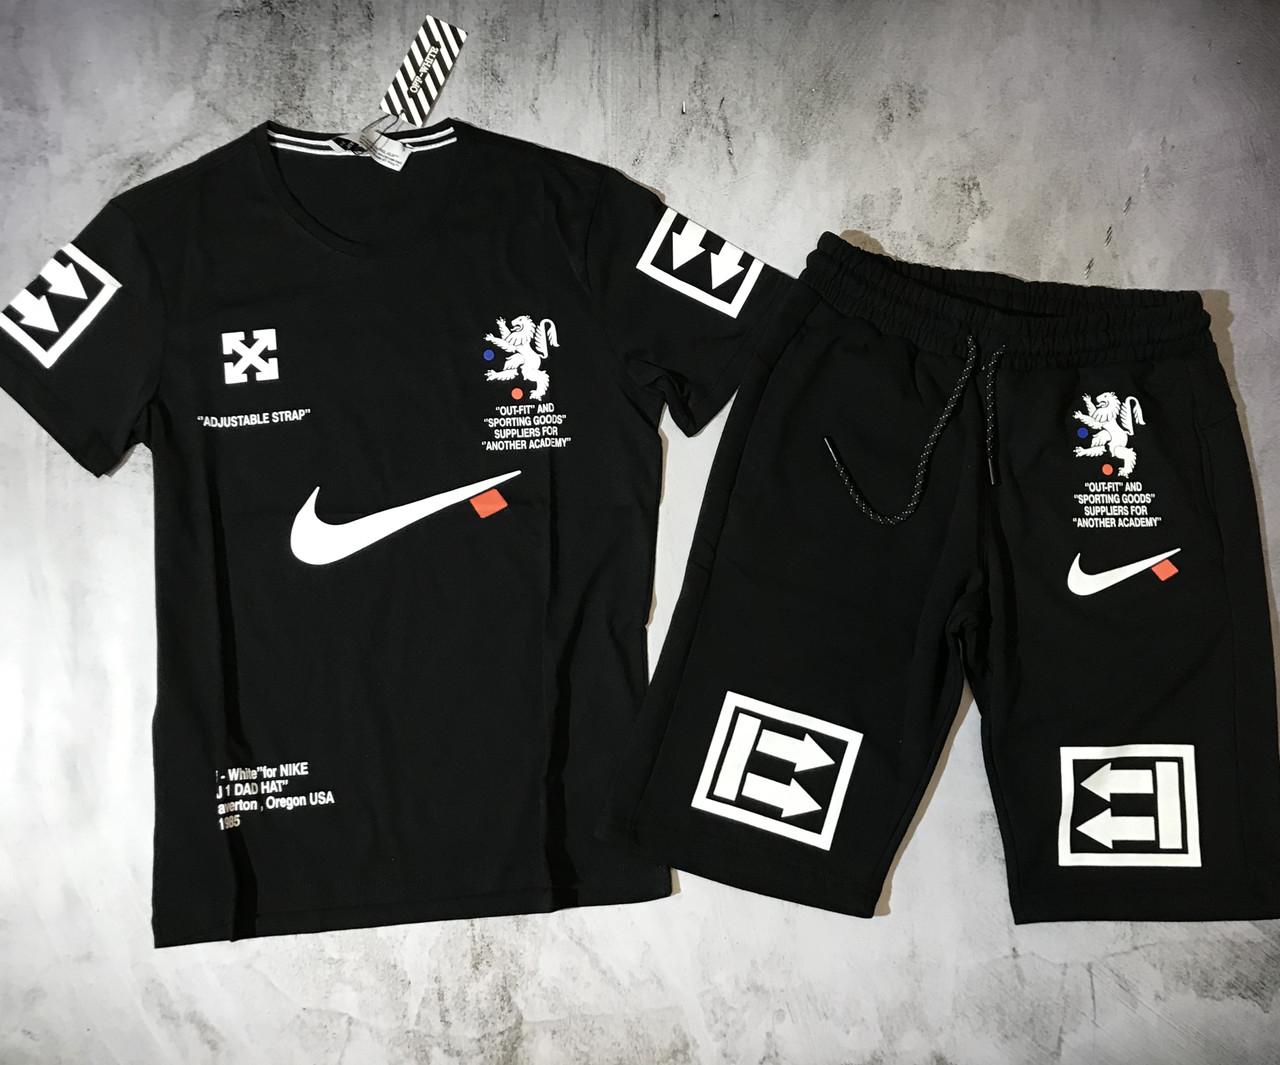 f0238e4a77ad Мужской спортивный костюм (футболка и шорты) Nike Lion king: продажа ...